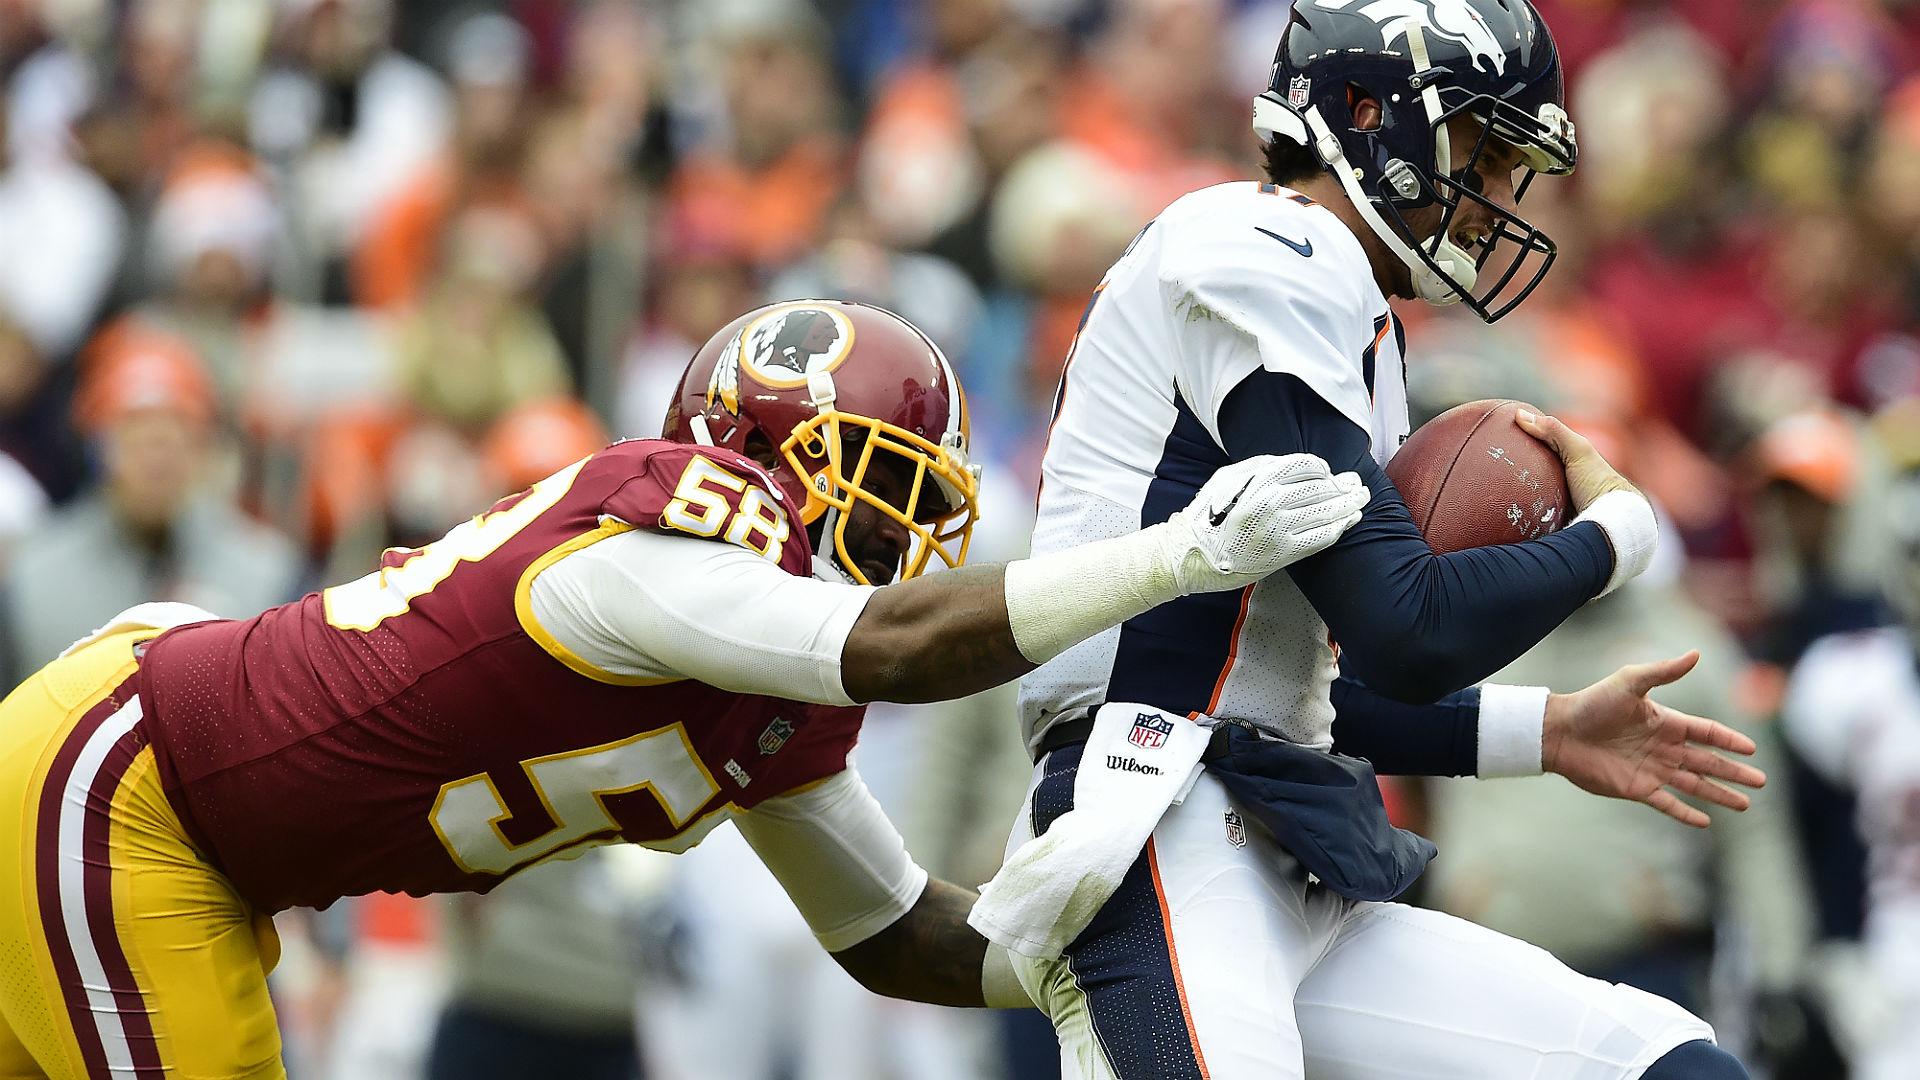 NFL free agency rumors: 'Good possibility' Rams sign linebacker Junior Galette